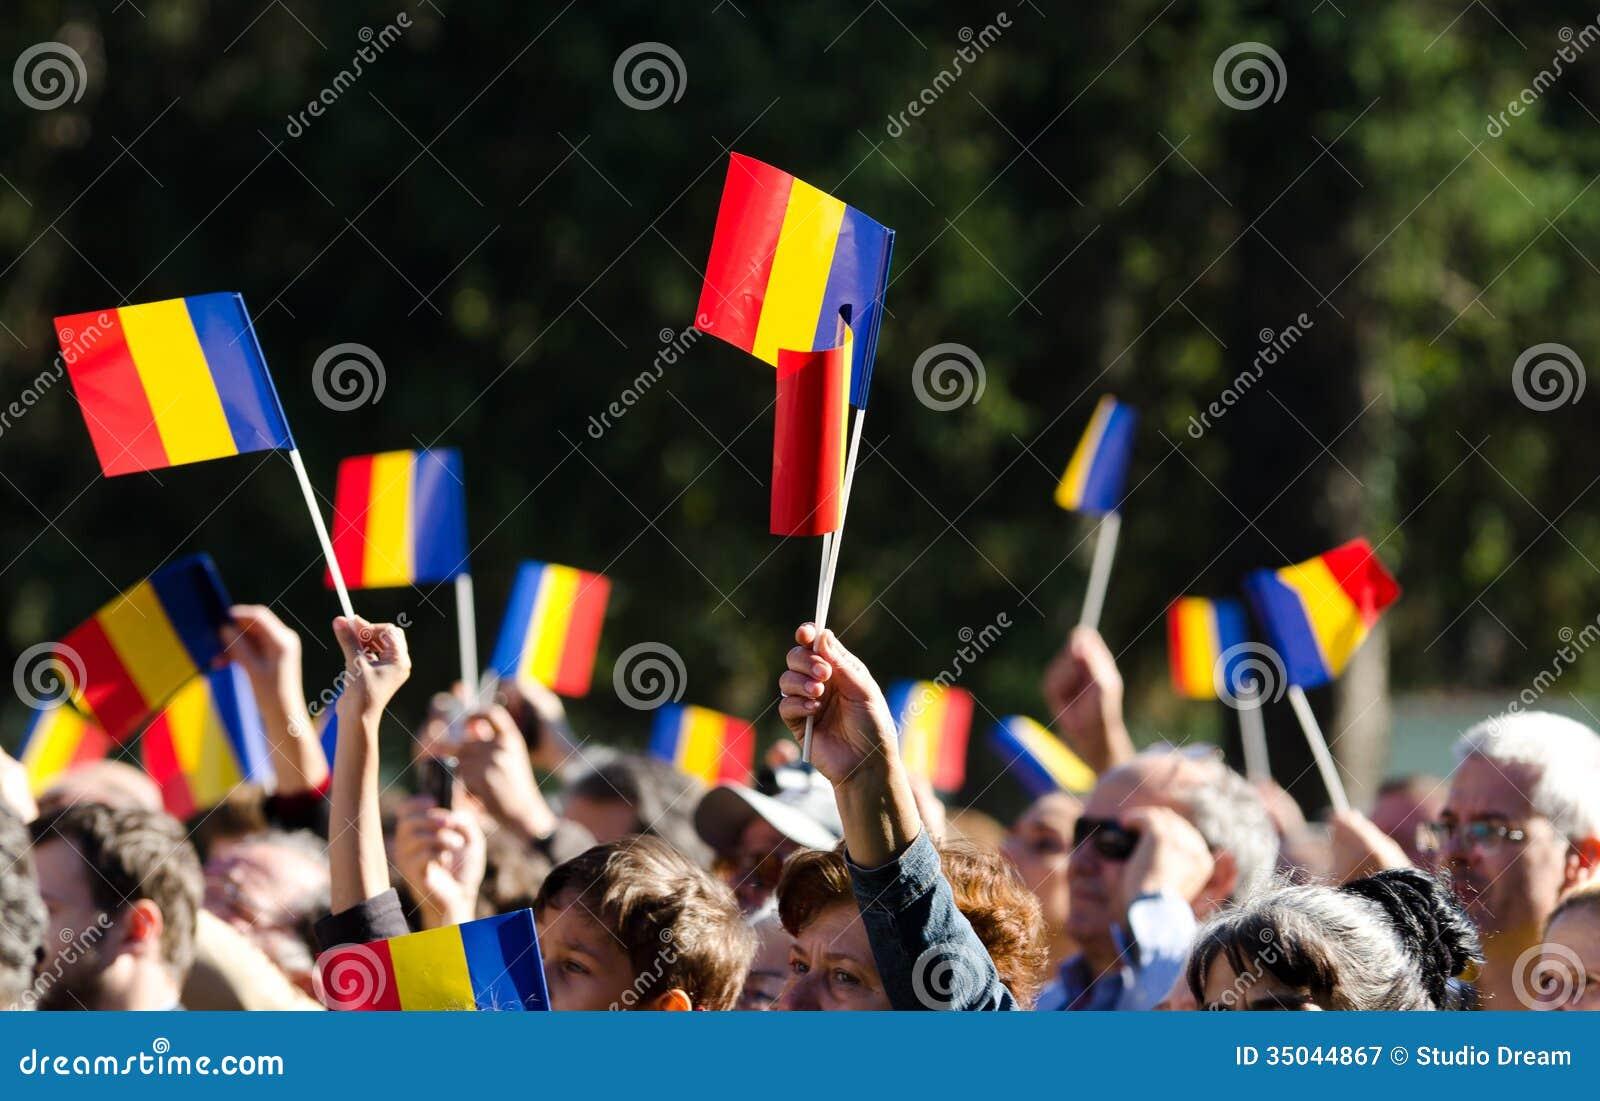 Romanian crowd waving flags